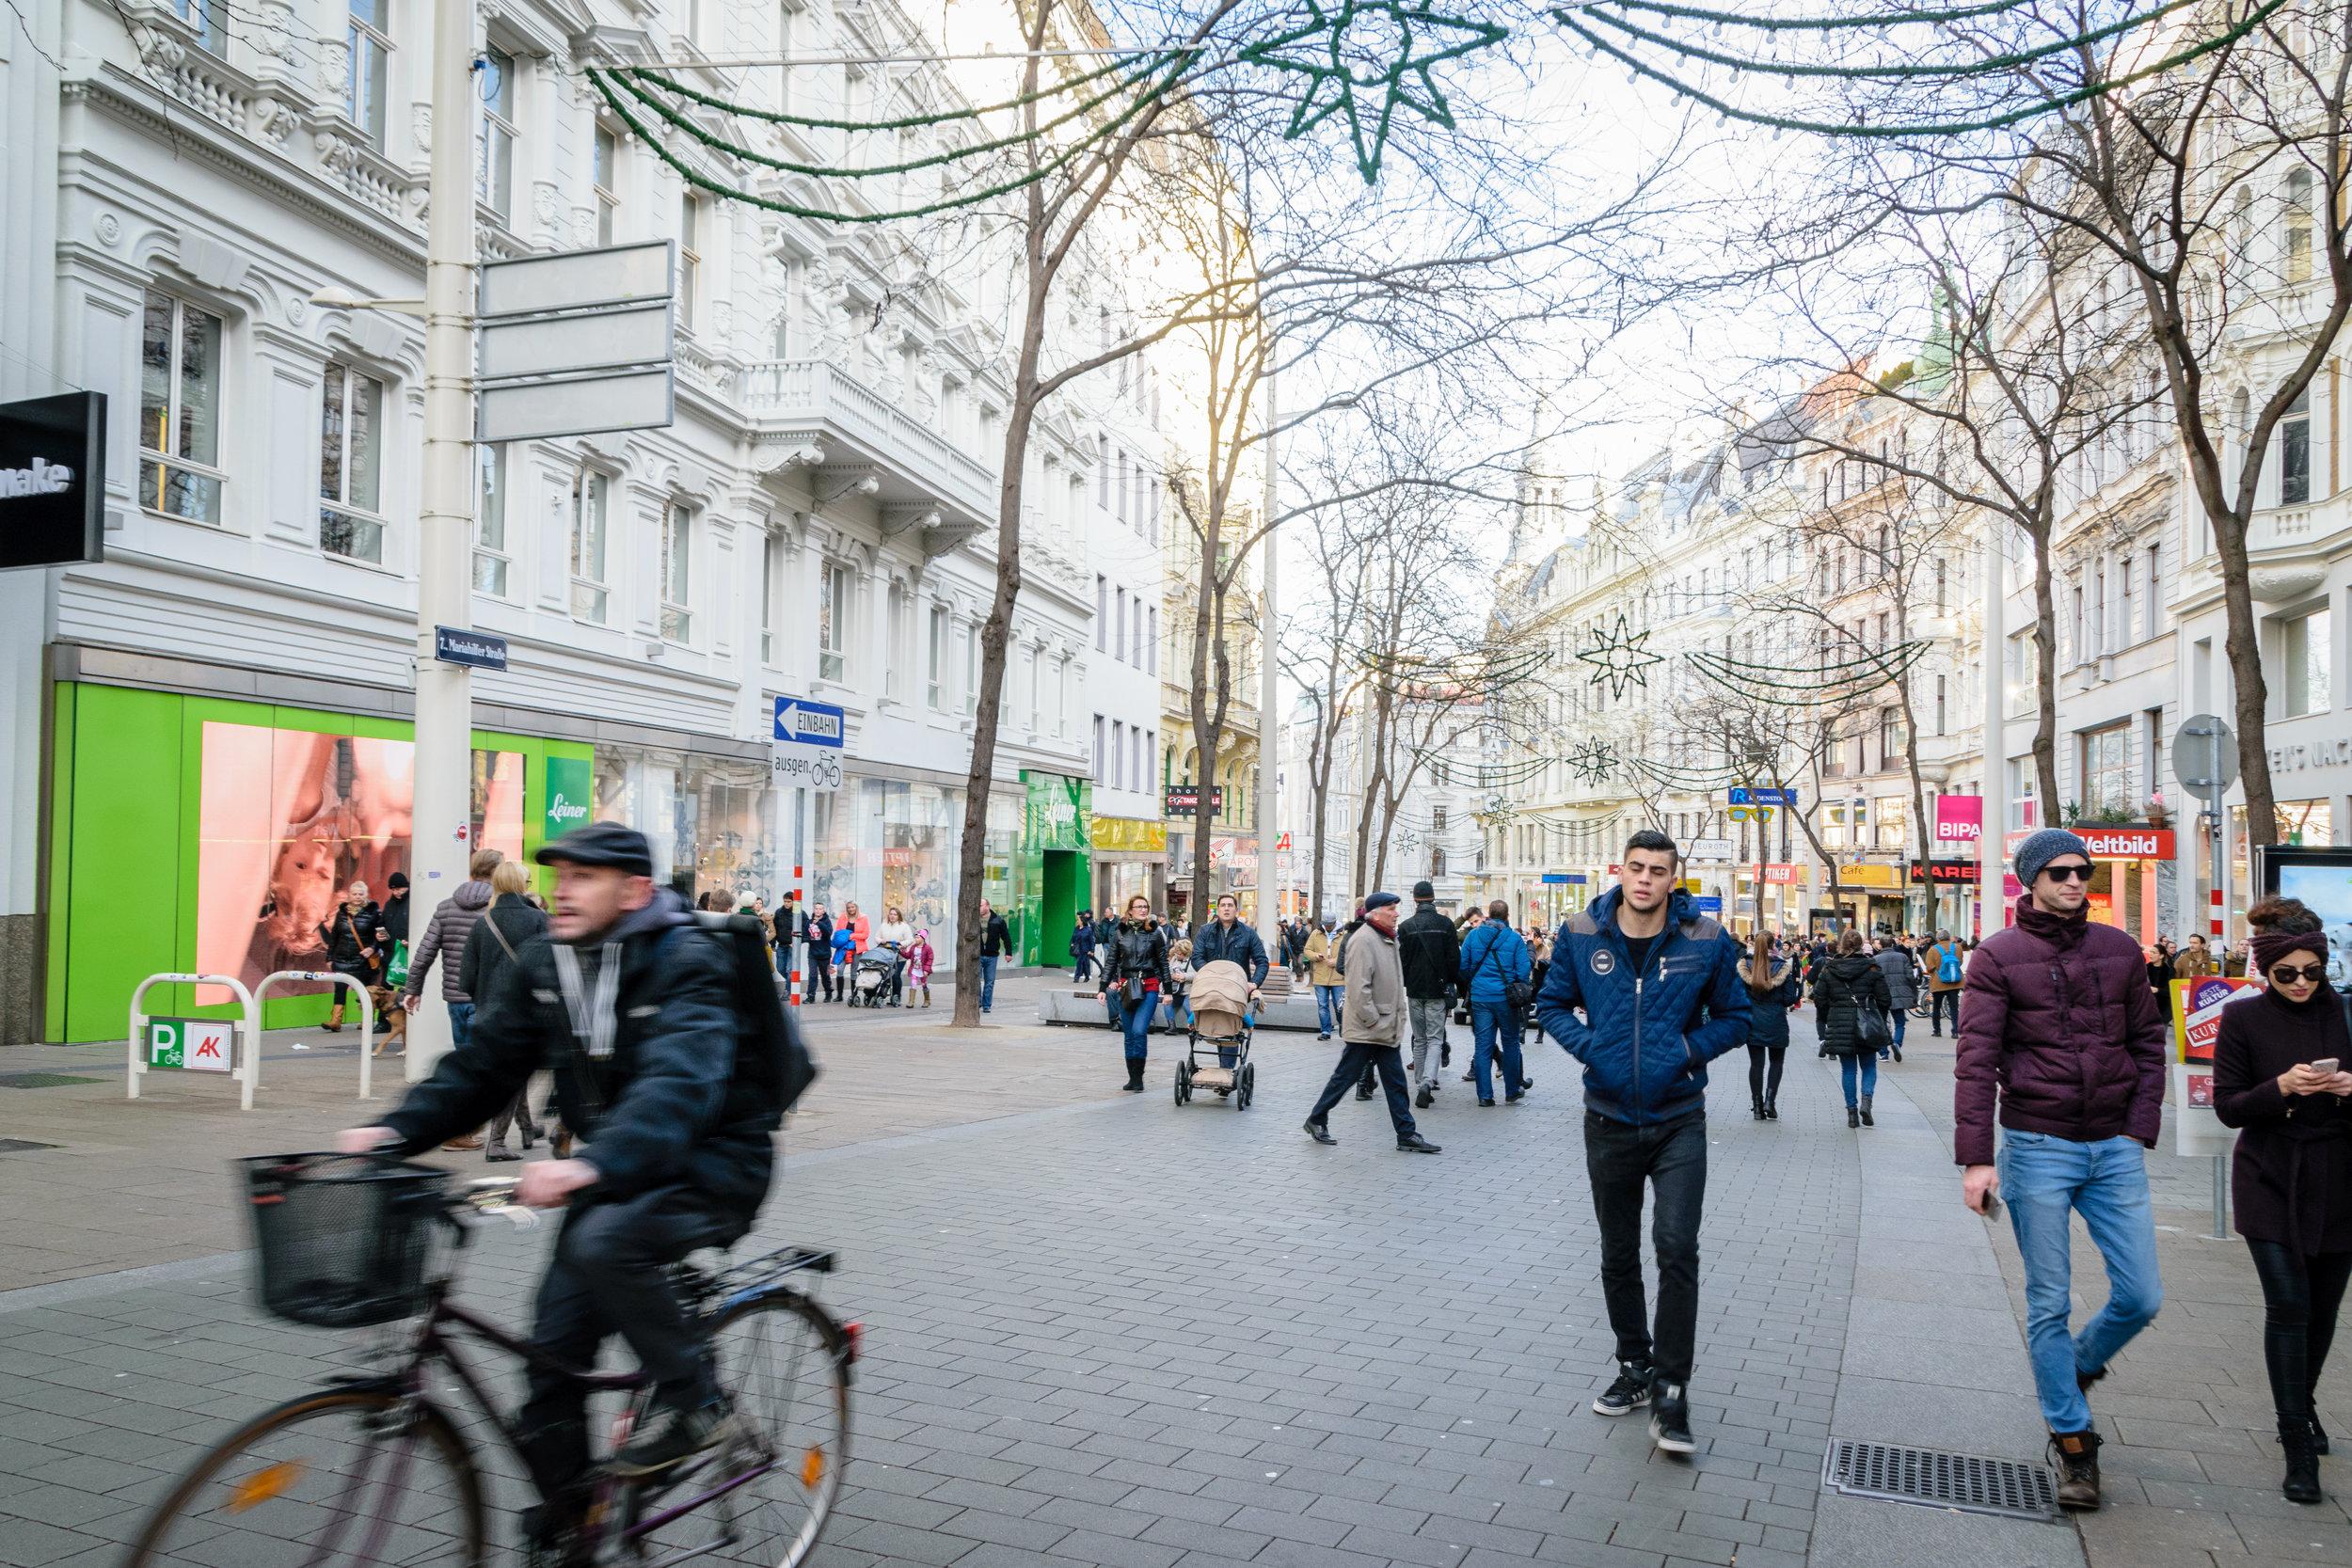 Kärntner Strasse pedestrian zone